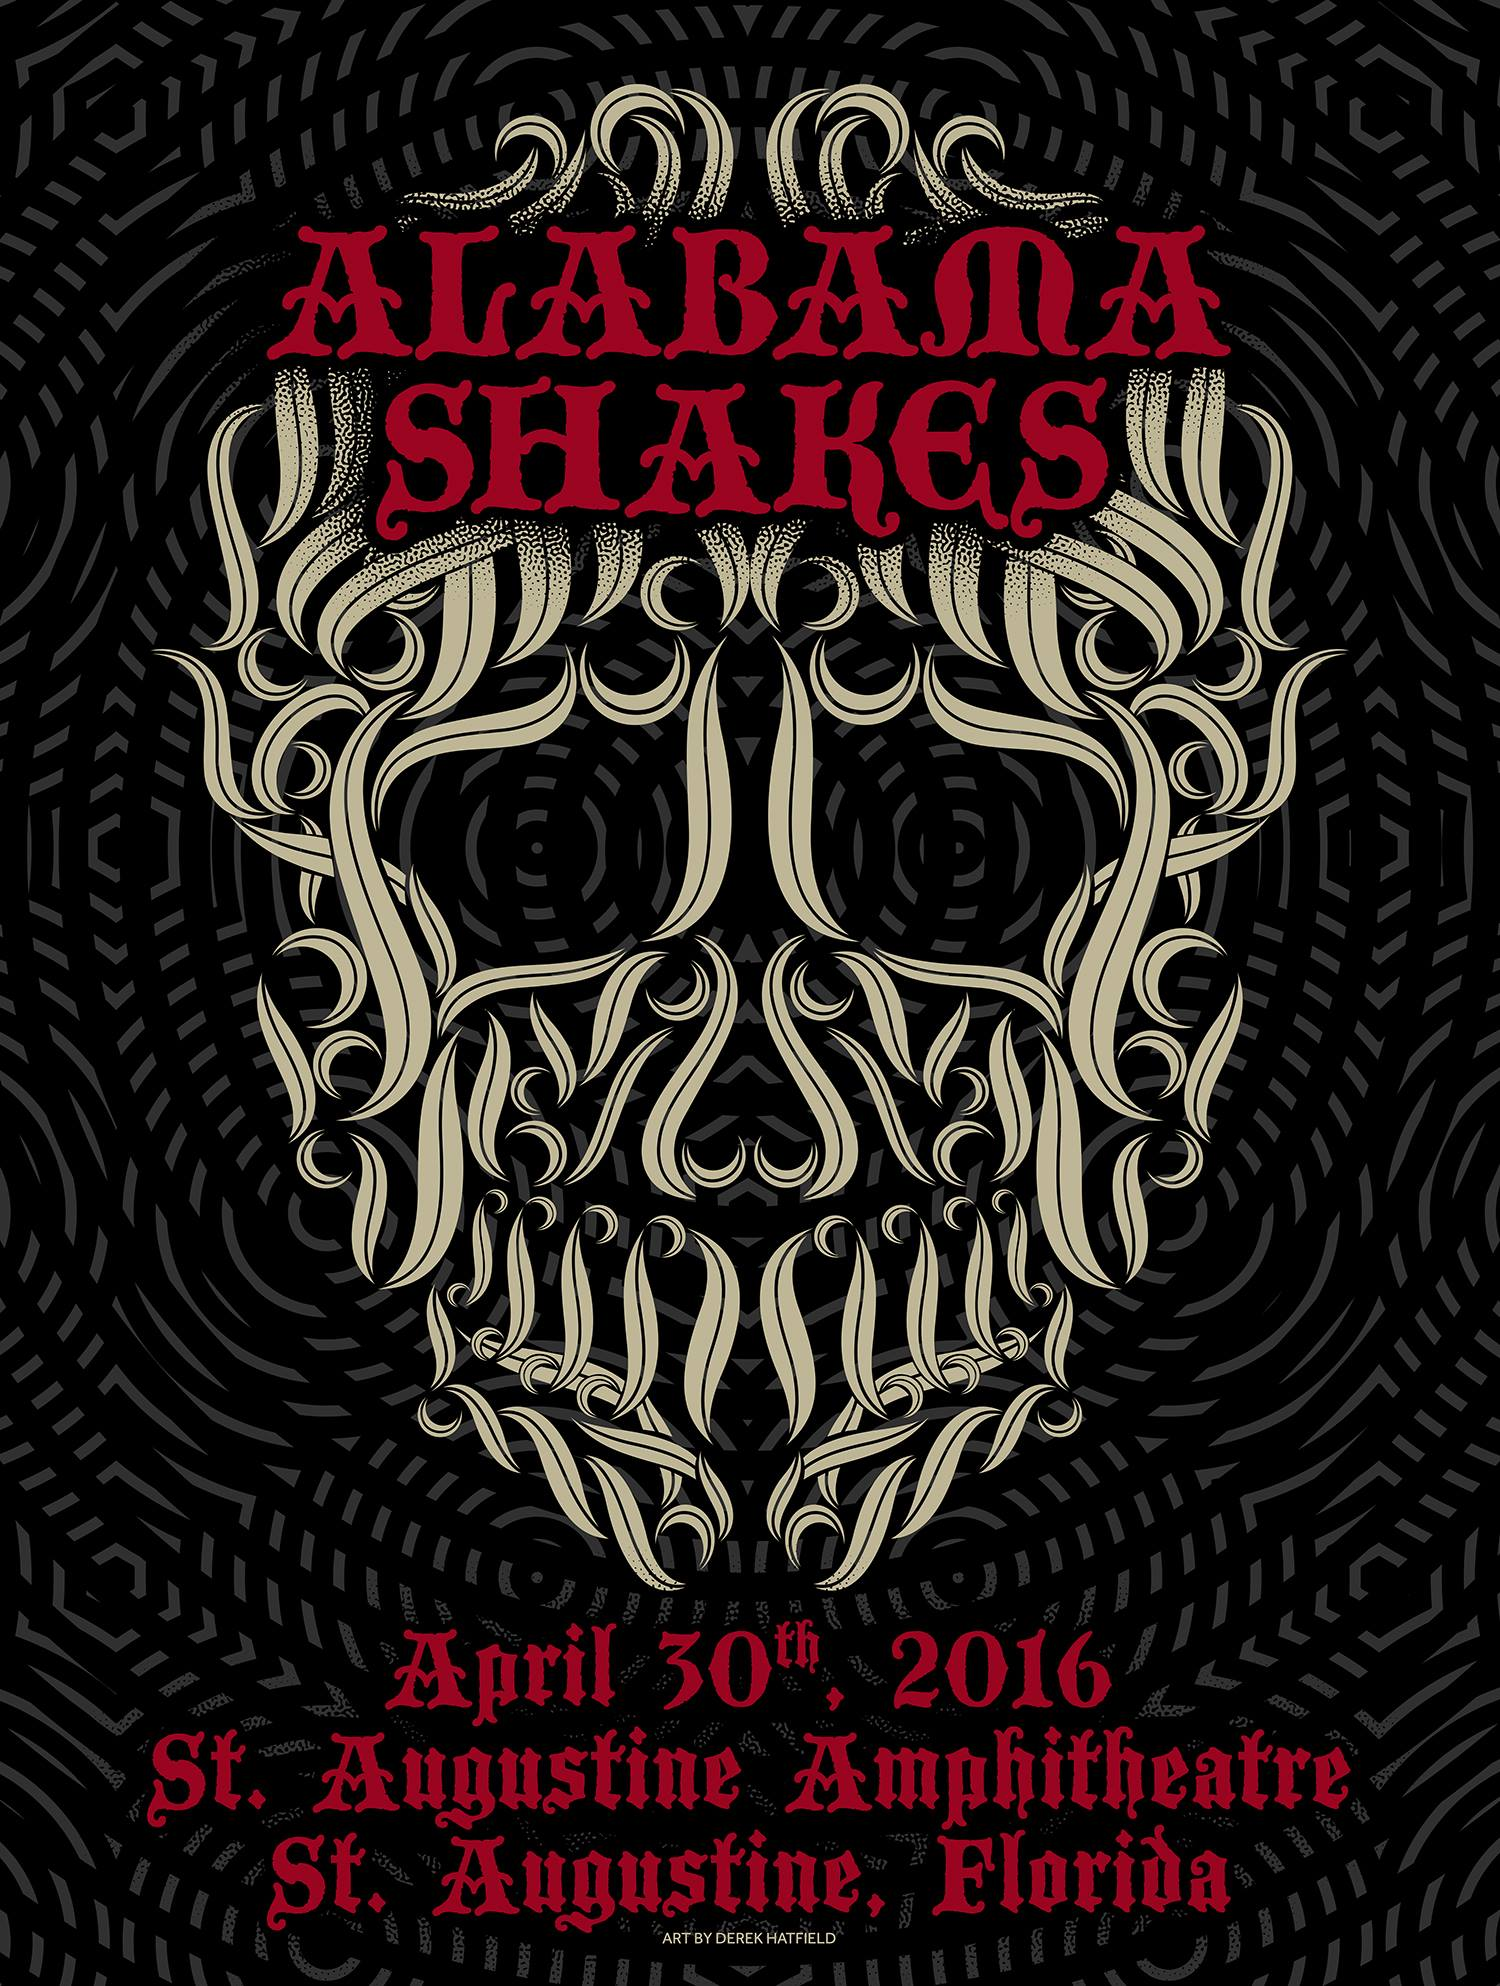 Alabama Shakes - 4.30.2016